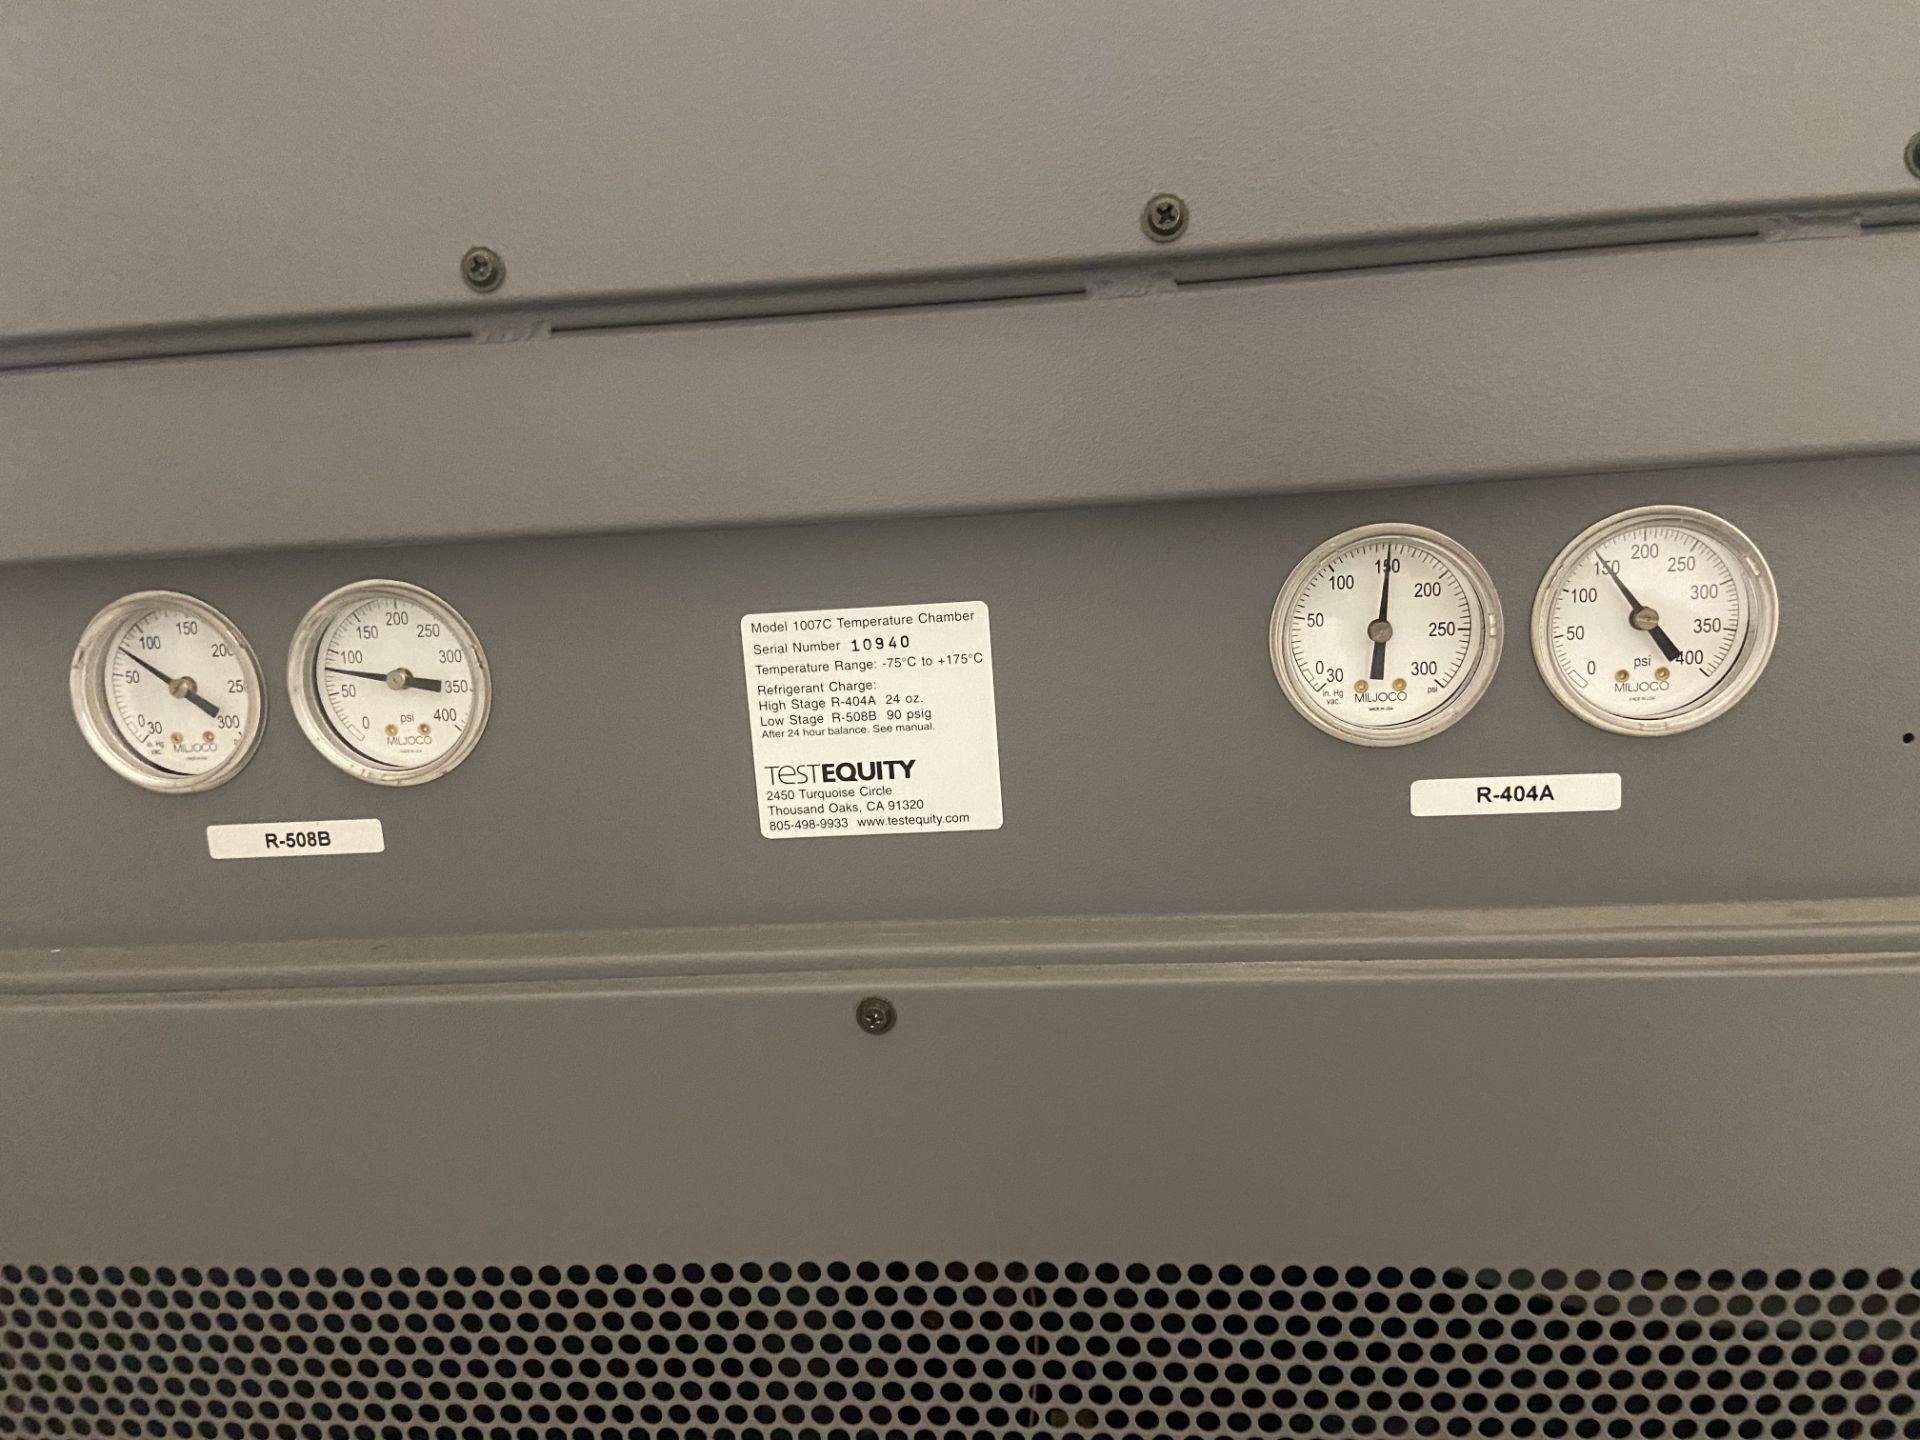 TestEquity Temperature Chamber, Model# 1007C, Serial# 10940, Temp Range: -75C to +175C, 208V, Single - Image 11 of 12